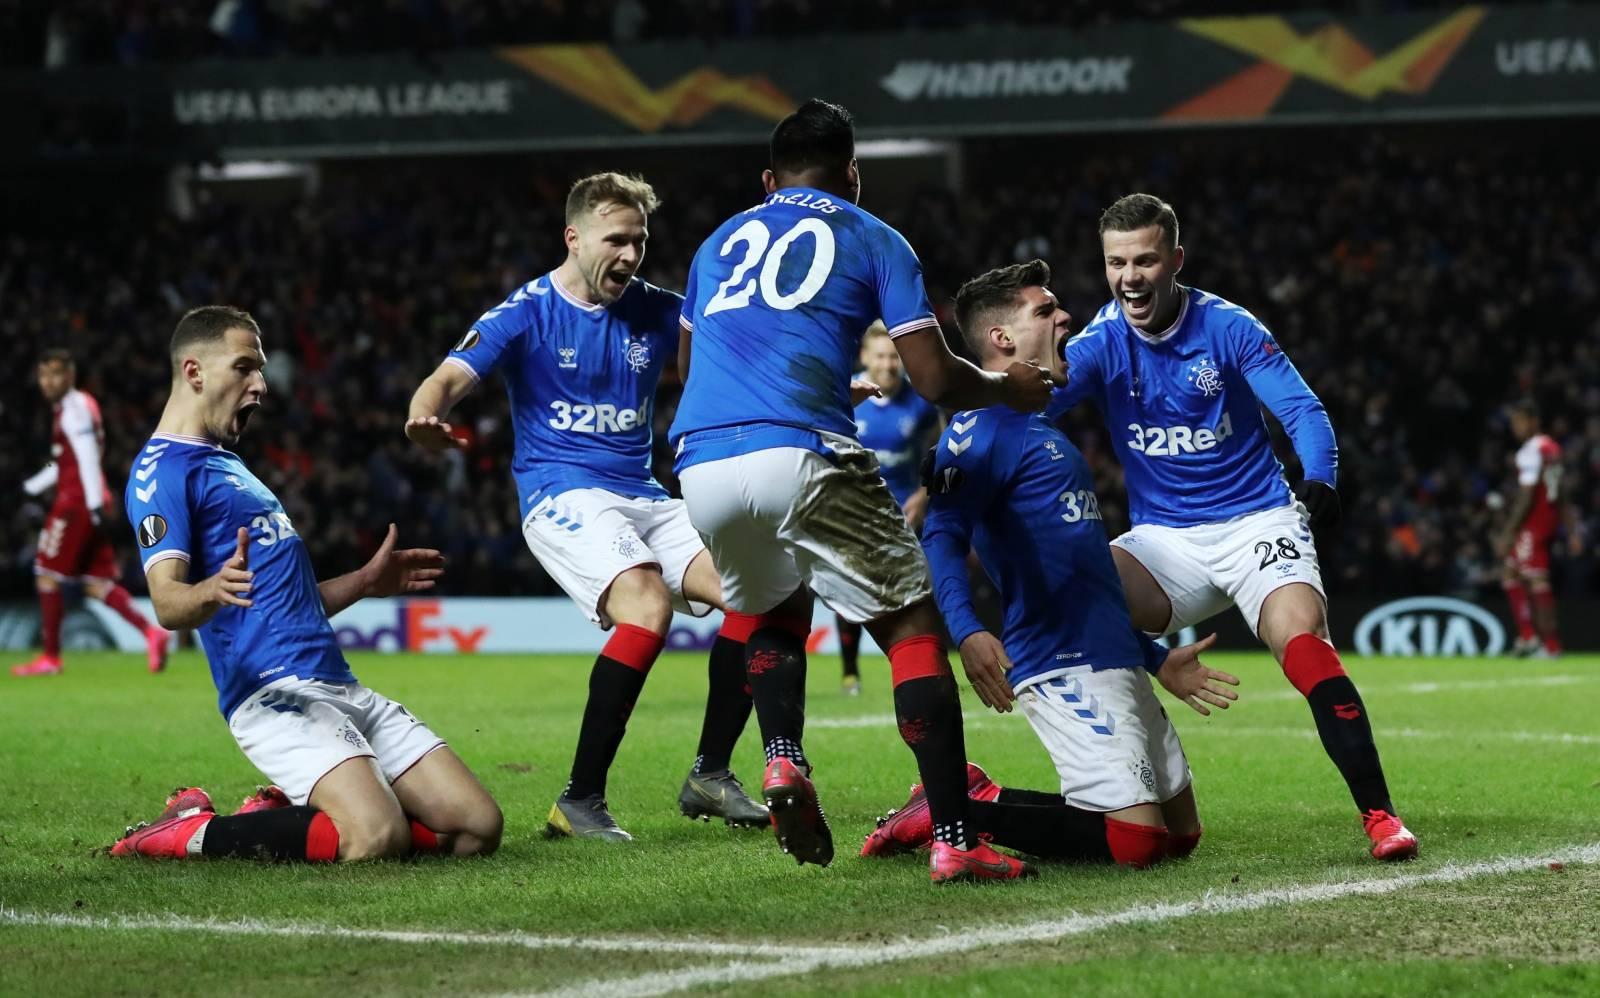 Europa League - Round of 32 First Leg - Rangers v S.C. Braga